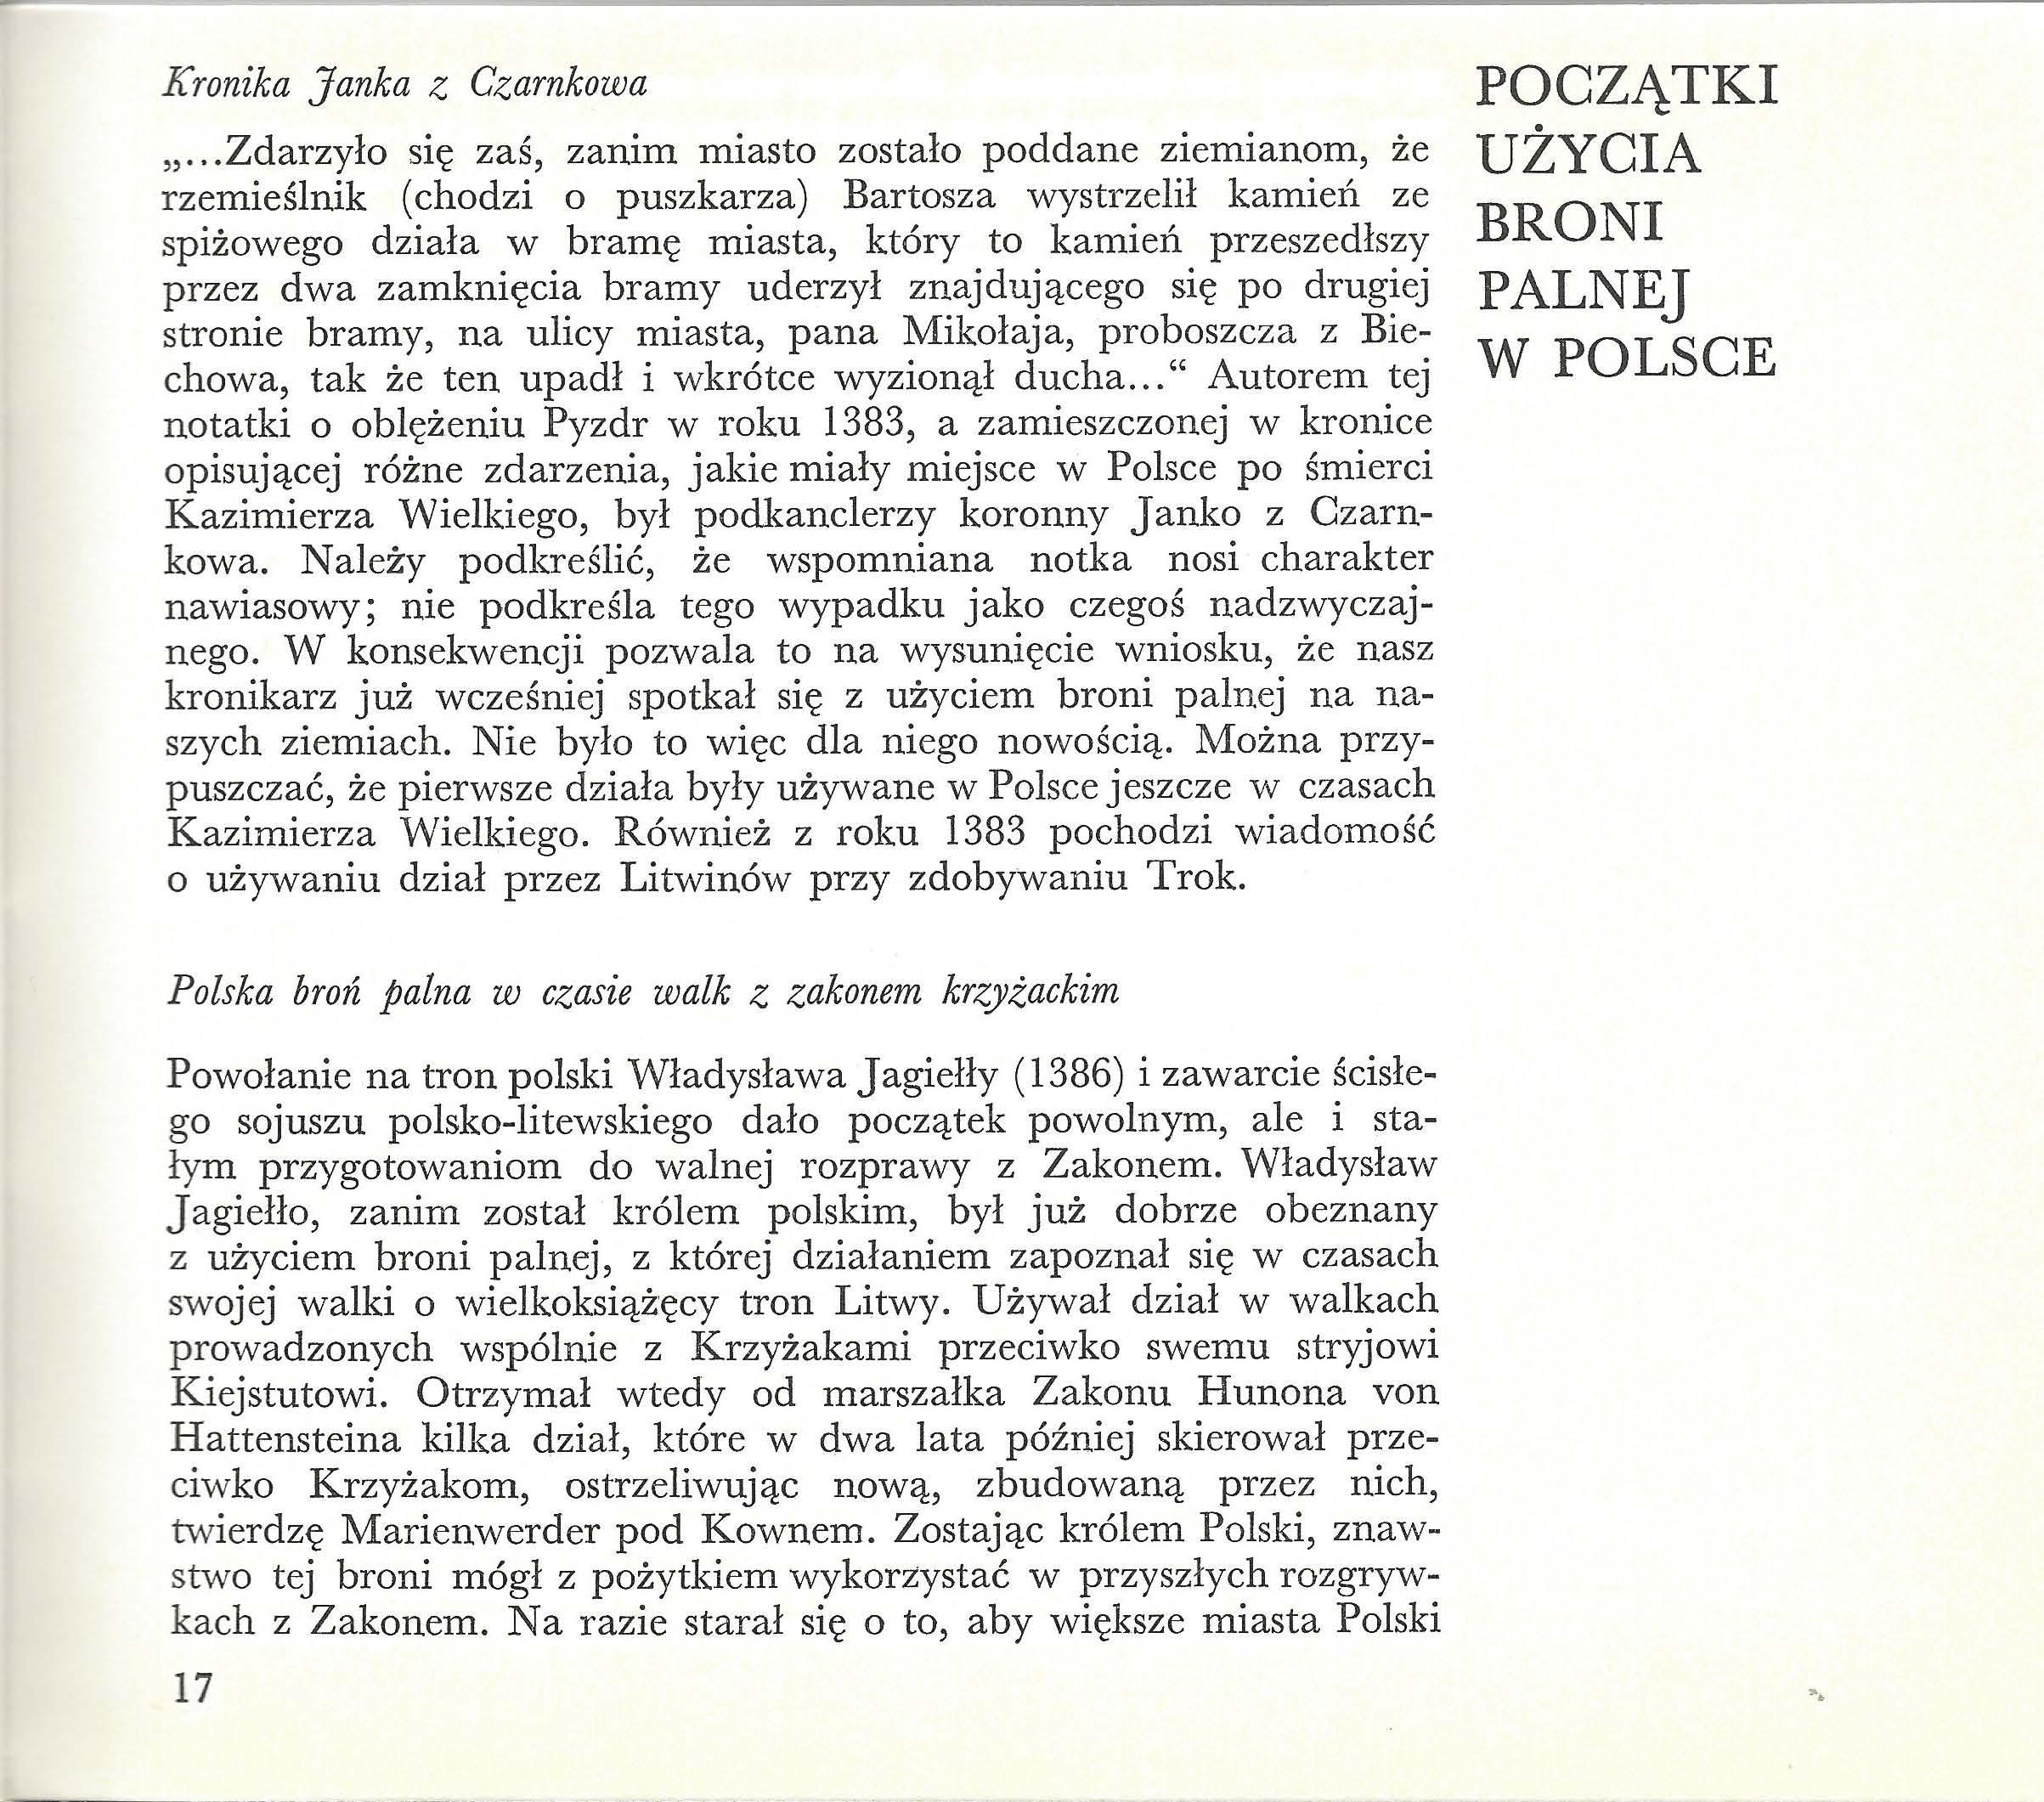 polska.bron.palna.kobielski15-23_Strona_1